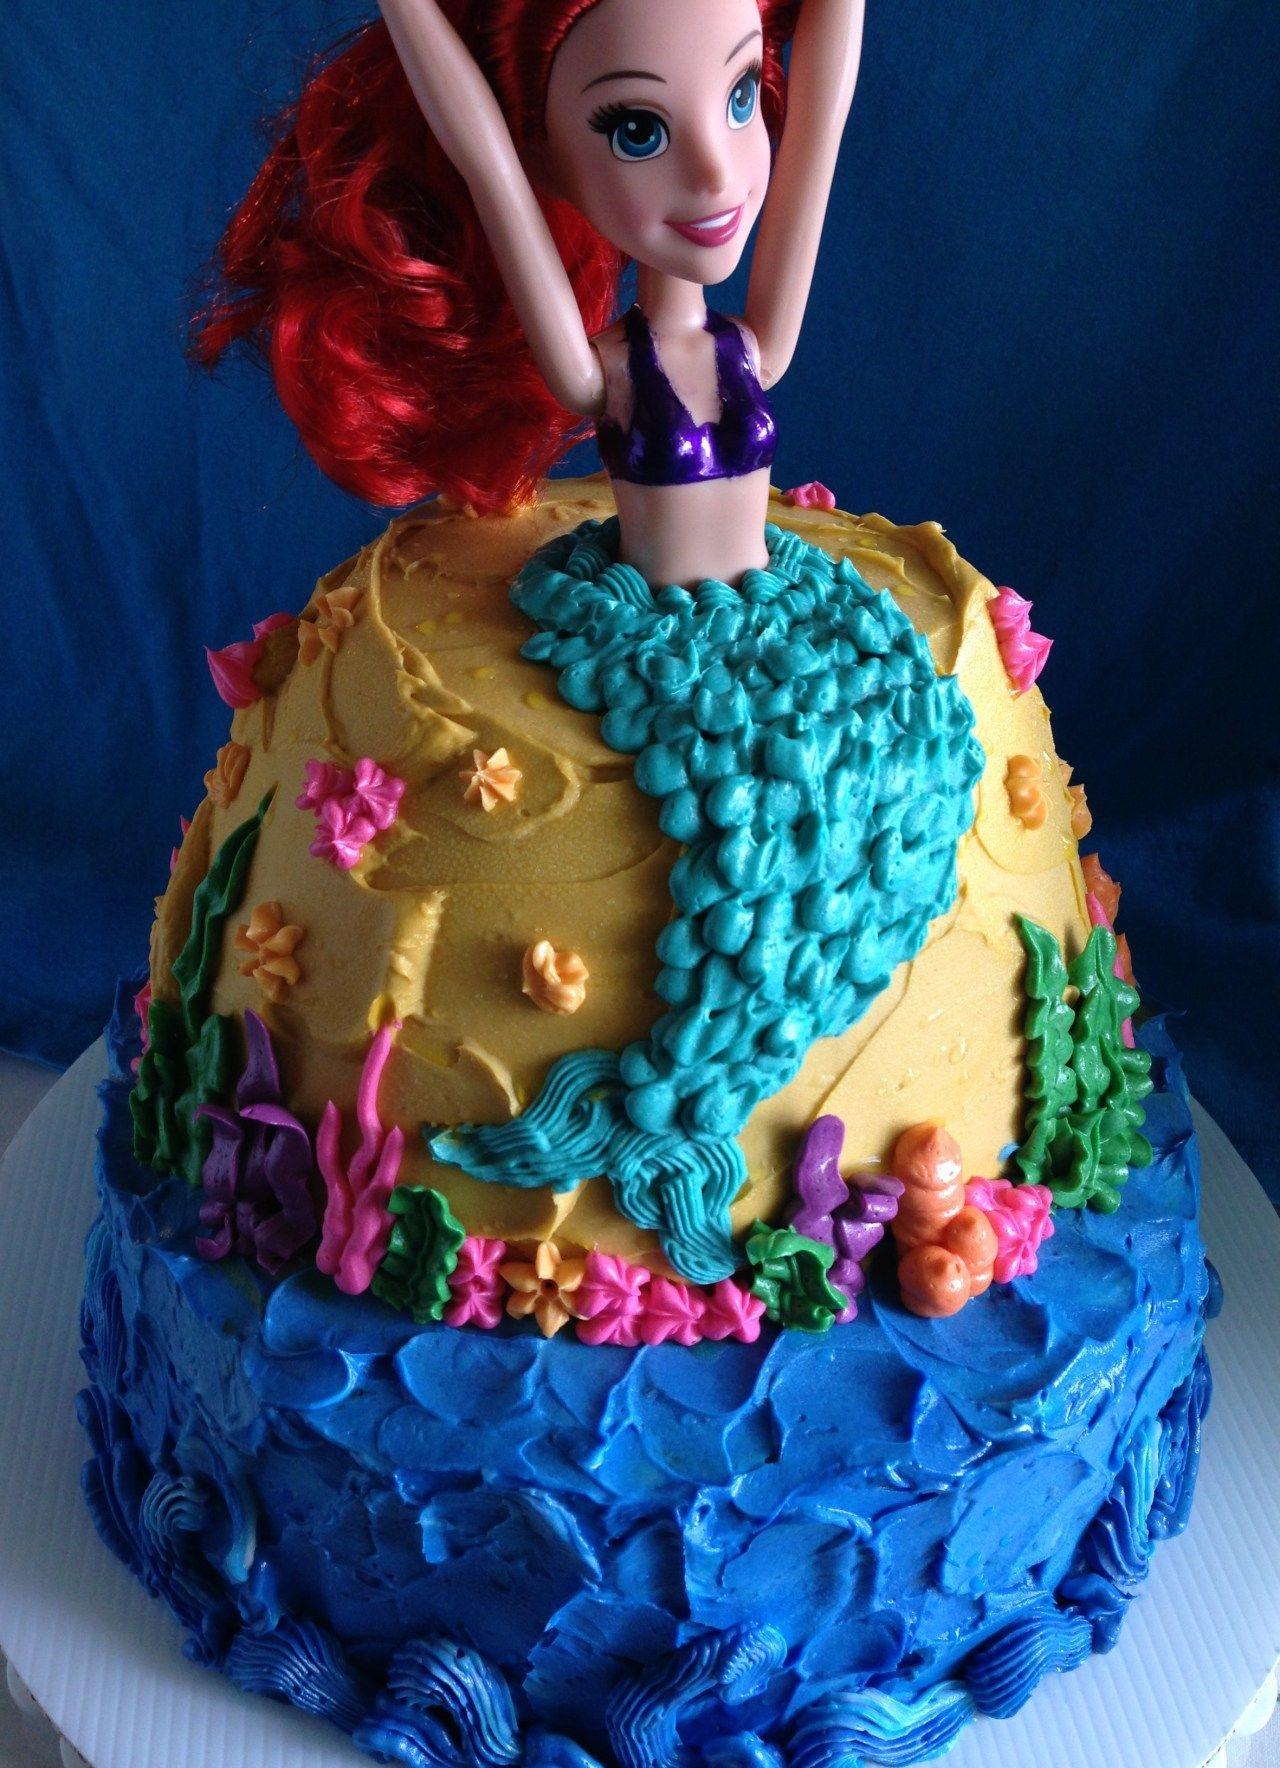 How to make an awesome mermaid cake epic sweet mermaid